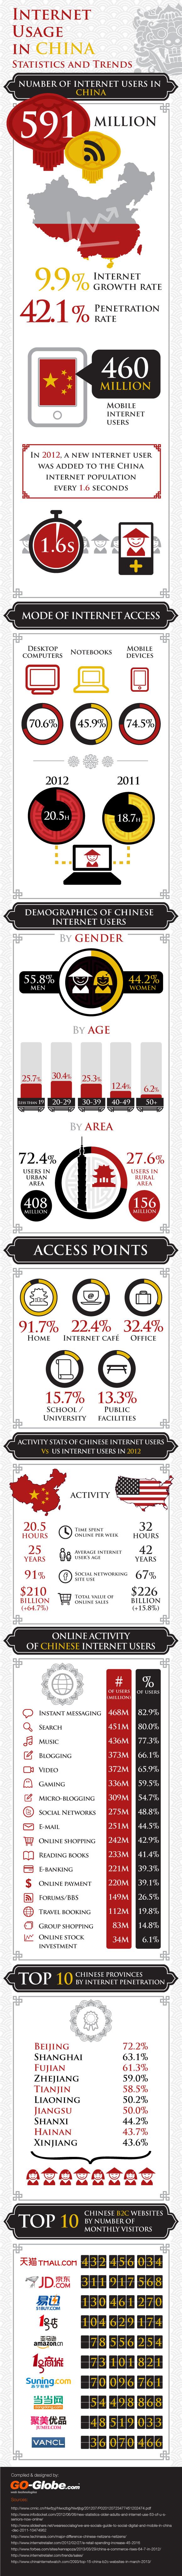 internet-china-2